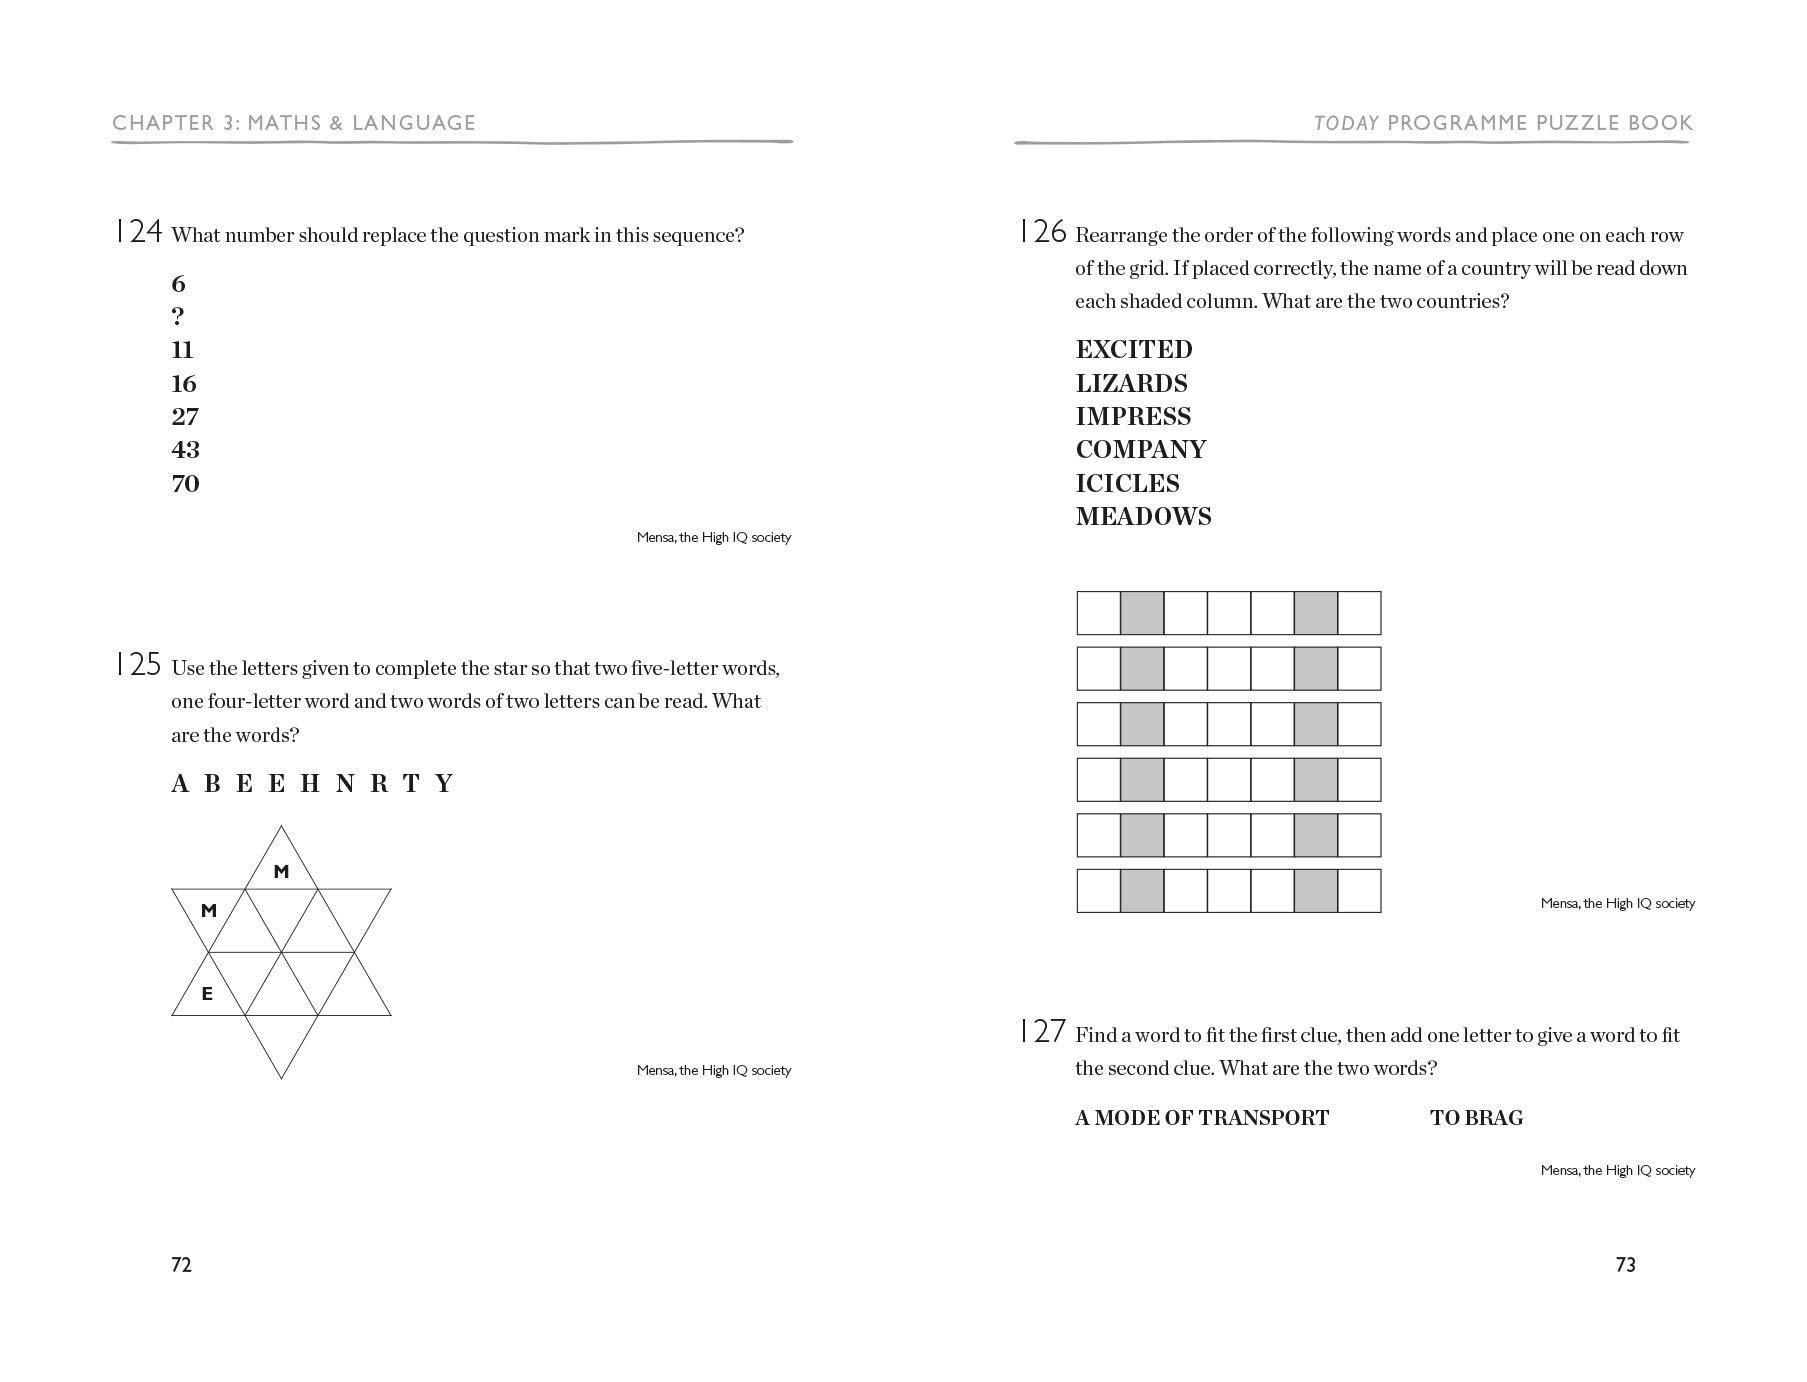 Today Programme Puzzle Book Bbc Author 9781788400589 Amazon Com Books